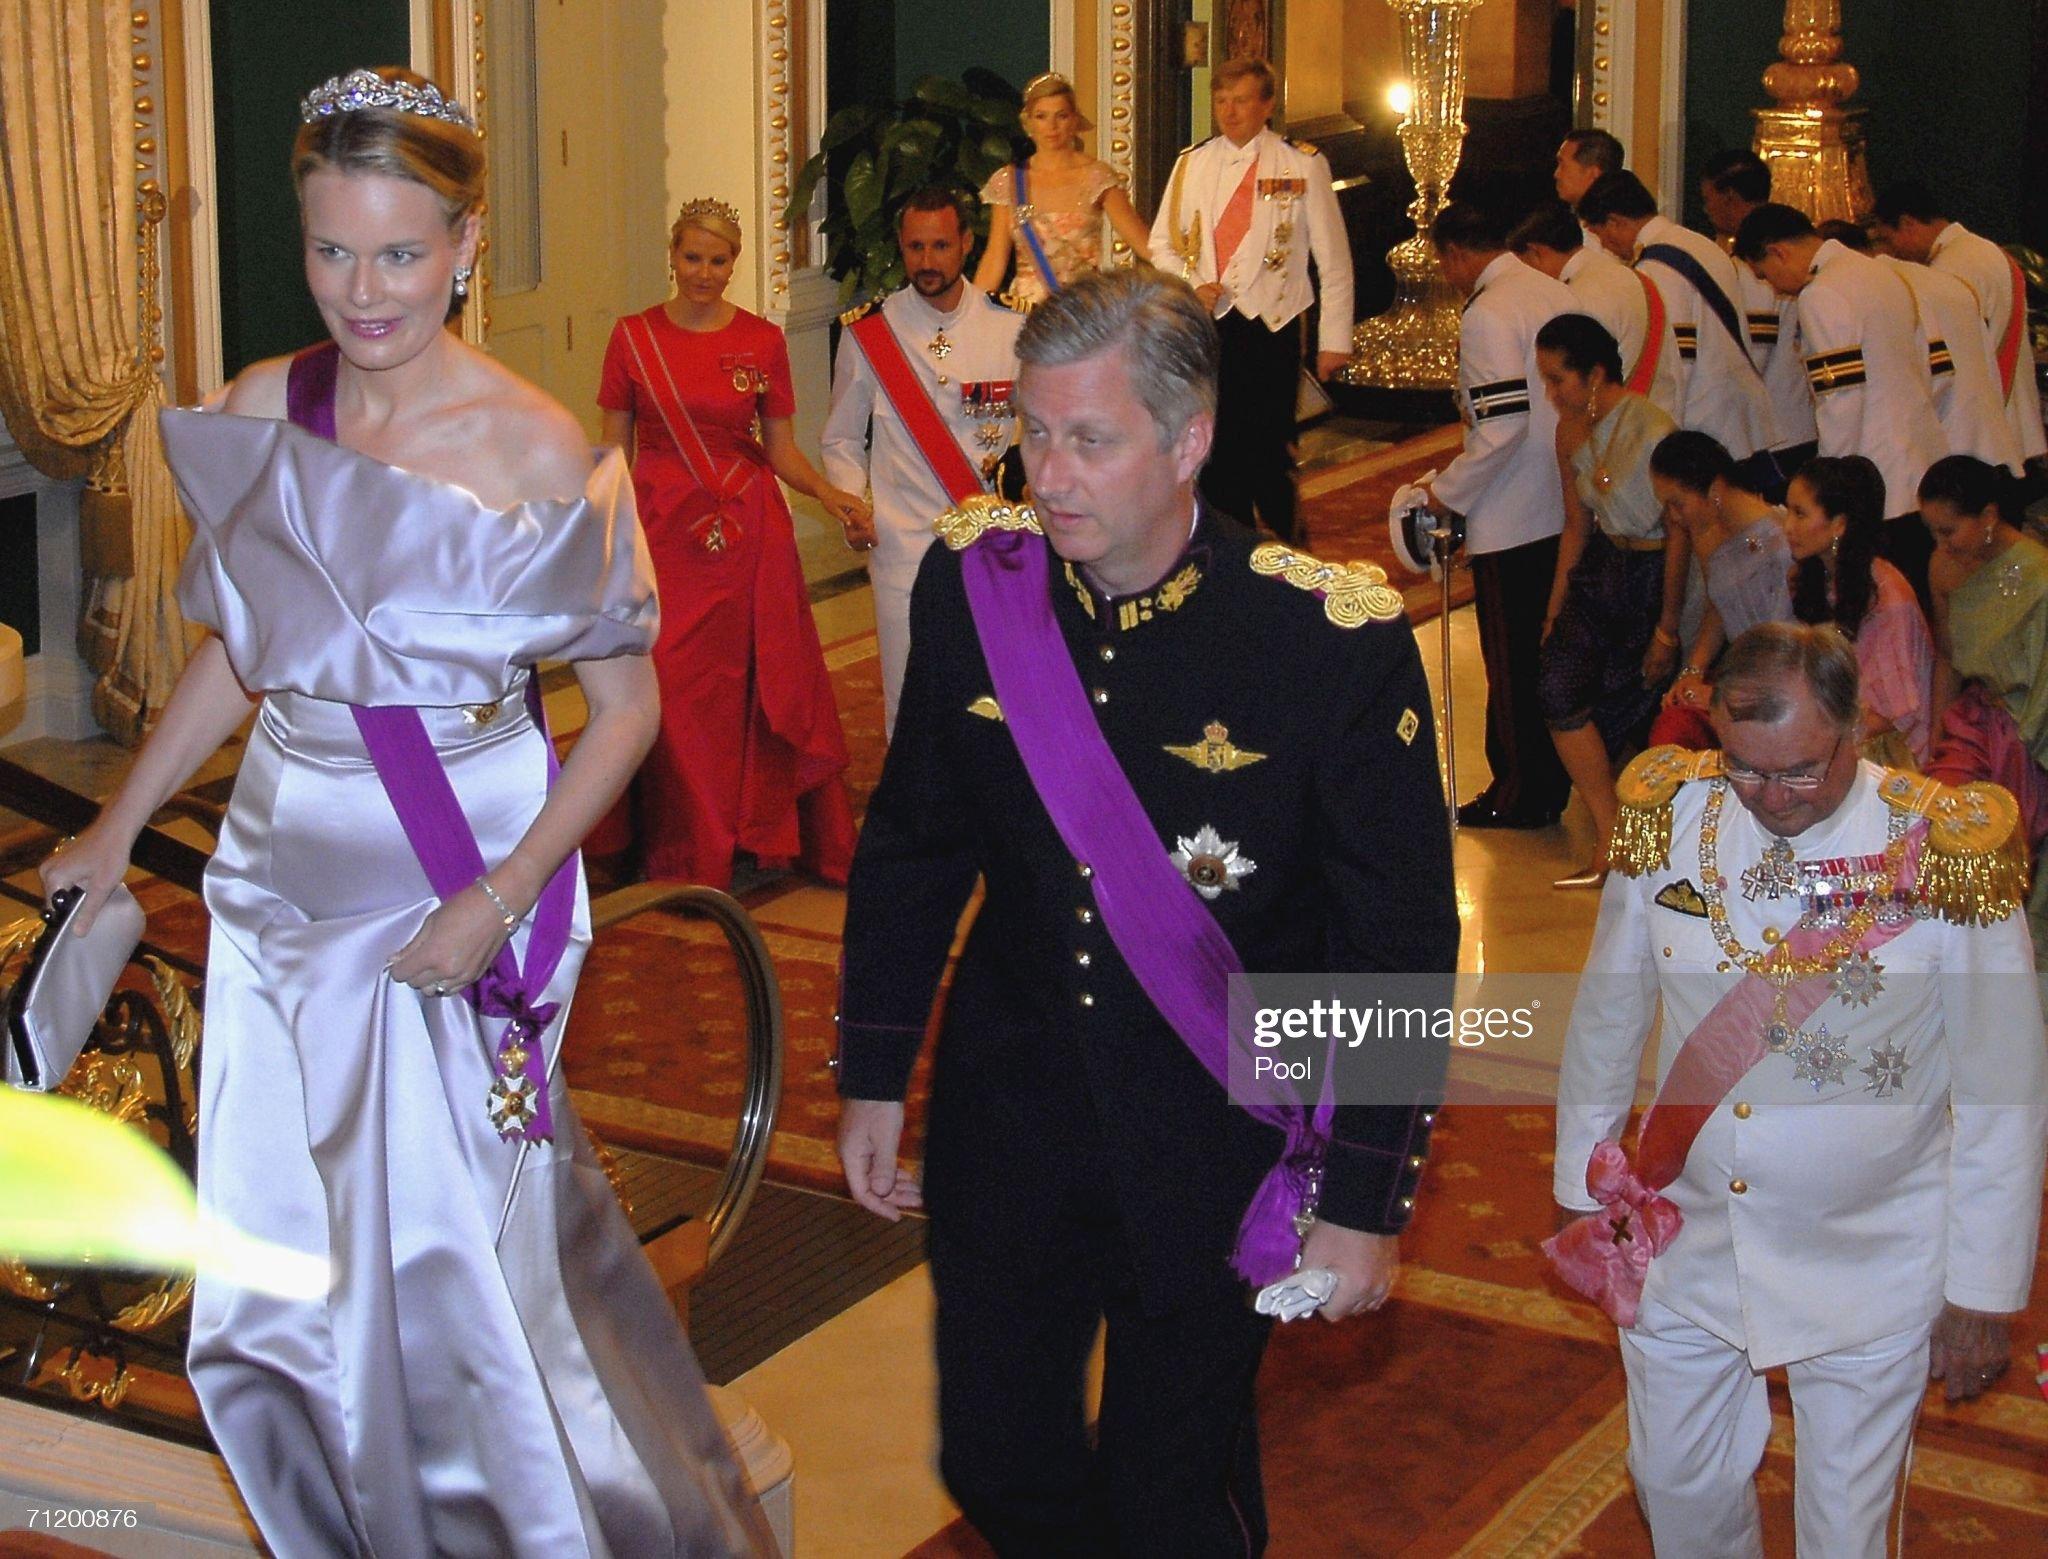 Вечерние наряды Королевы Матильды Banquet Celebrates Thailand King's 60th Anniversary : News Photo